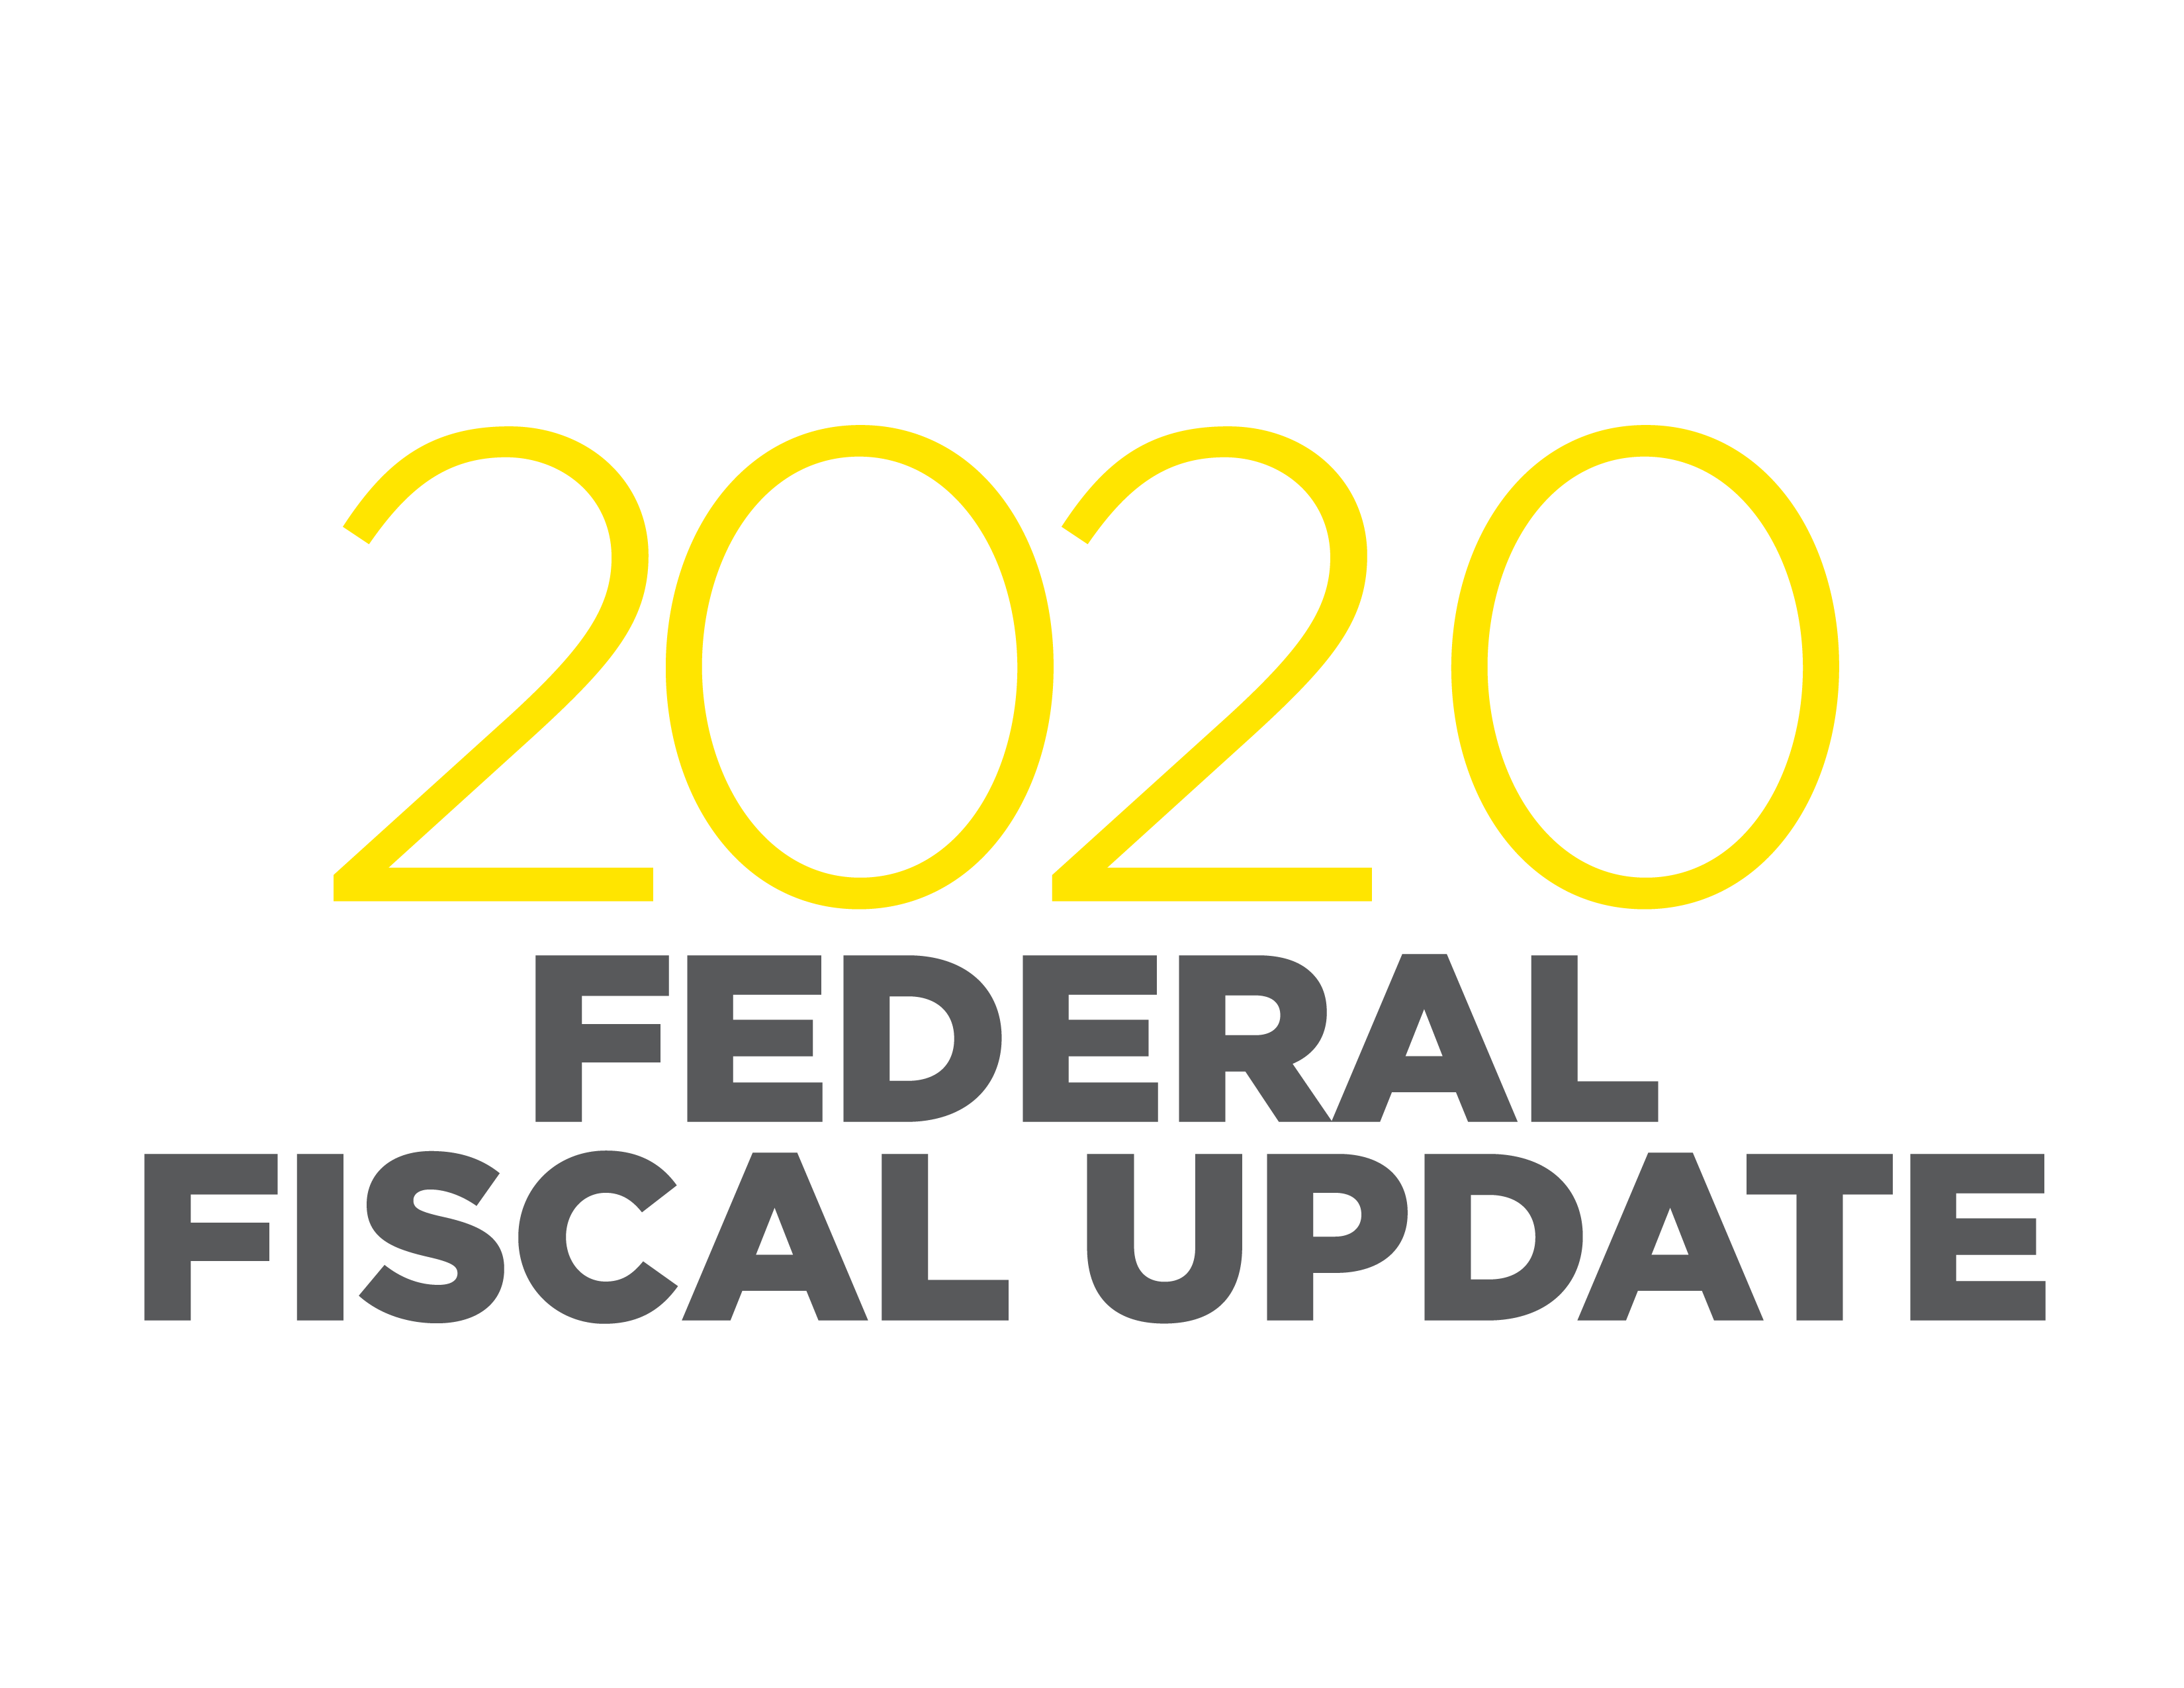 FEDERAL-FISCAL-UPDATE-2020 (1)